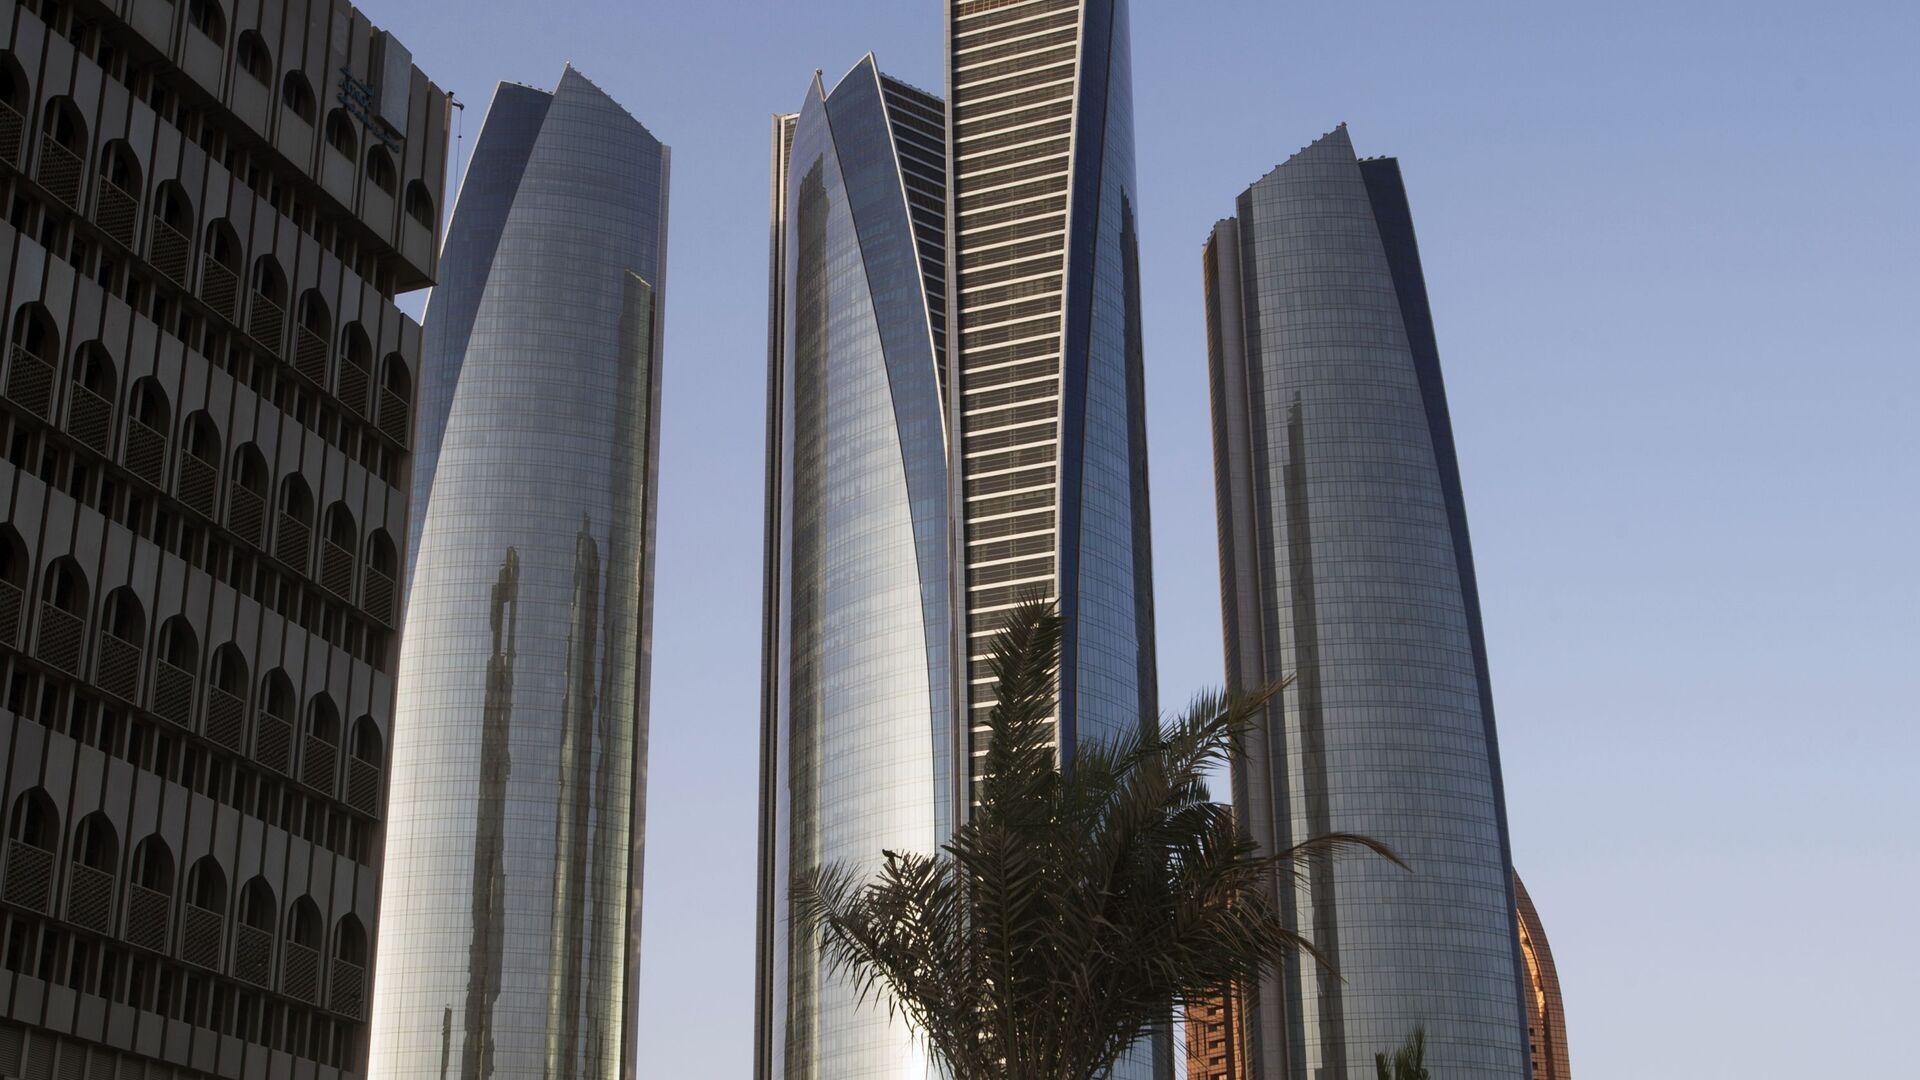 Abu Dhabi, la capitale degli Emirati Arabi Uniti - Sputnik Italia, 1920, 29.06.2021